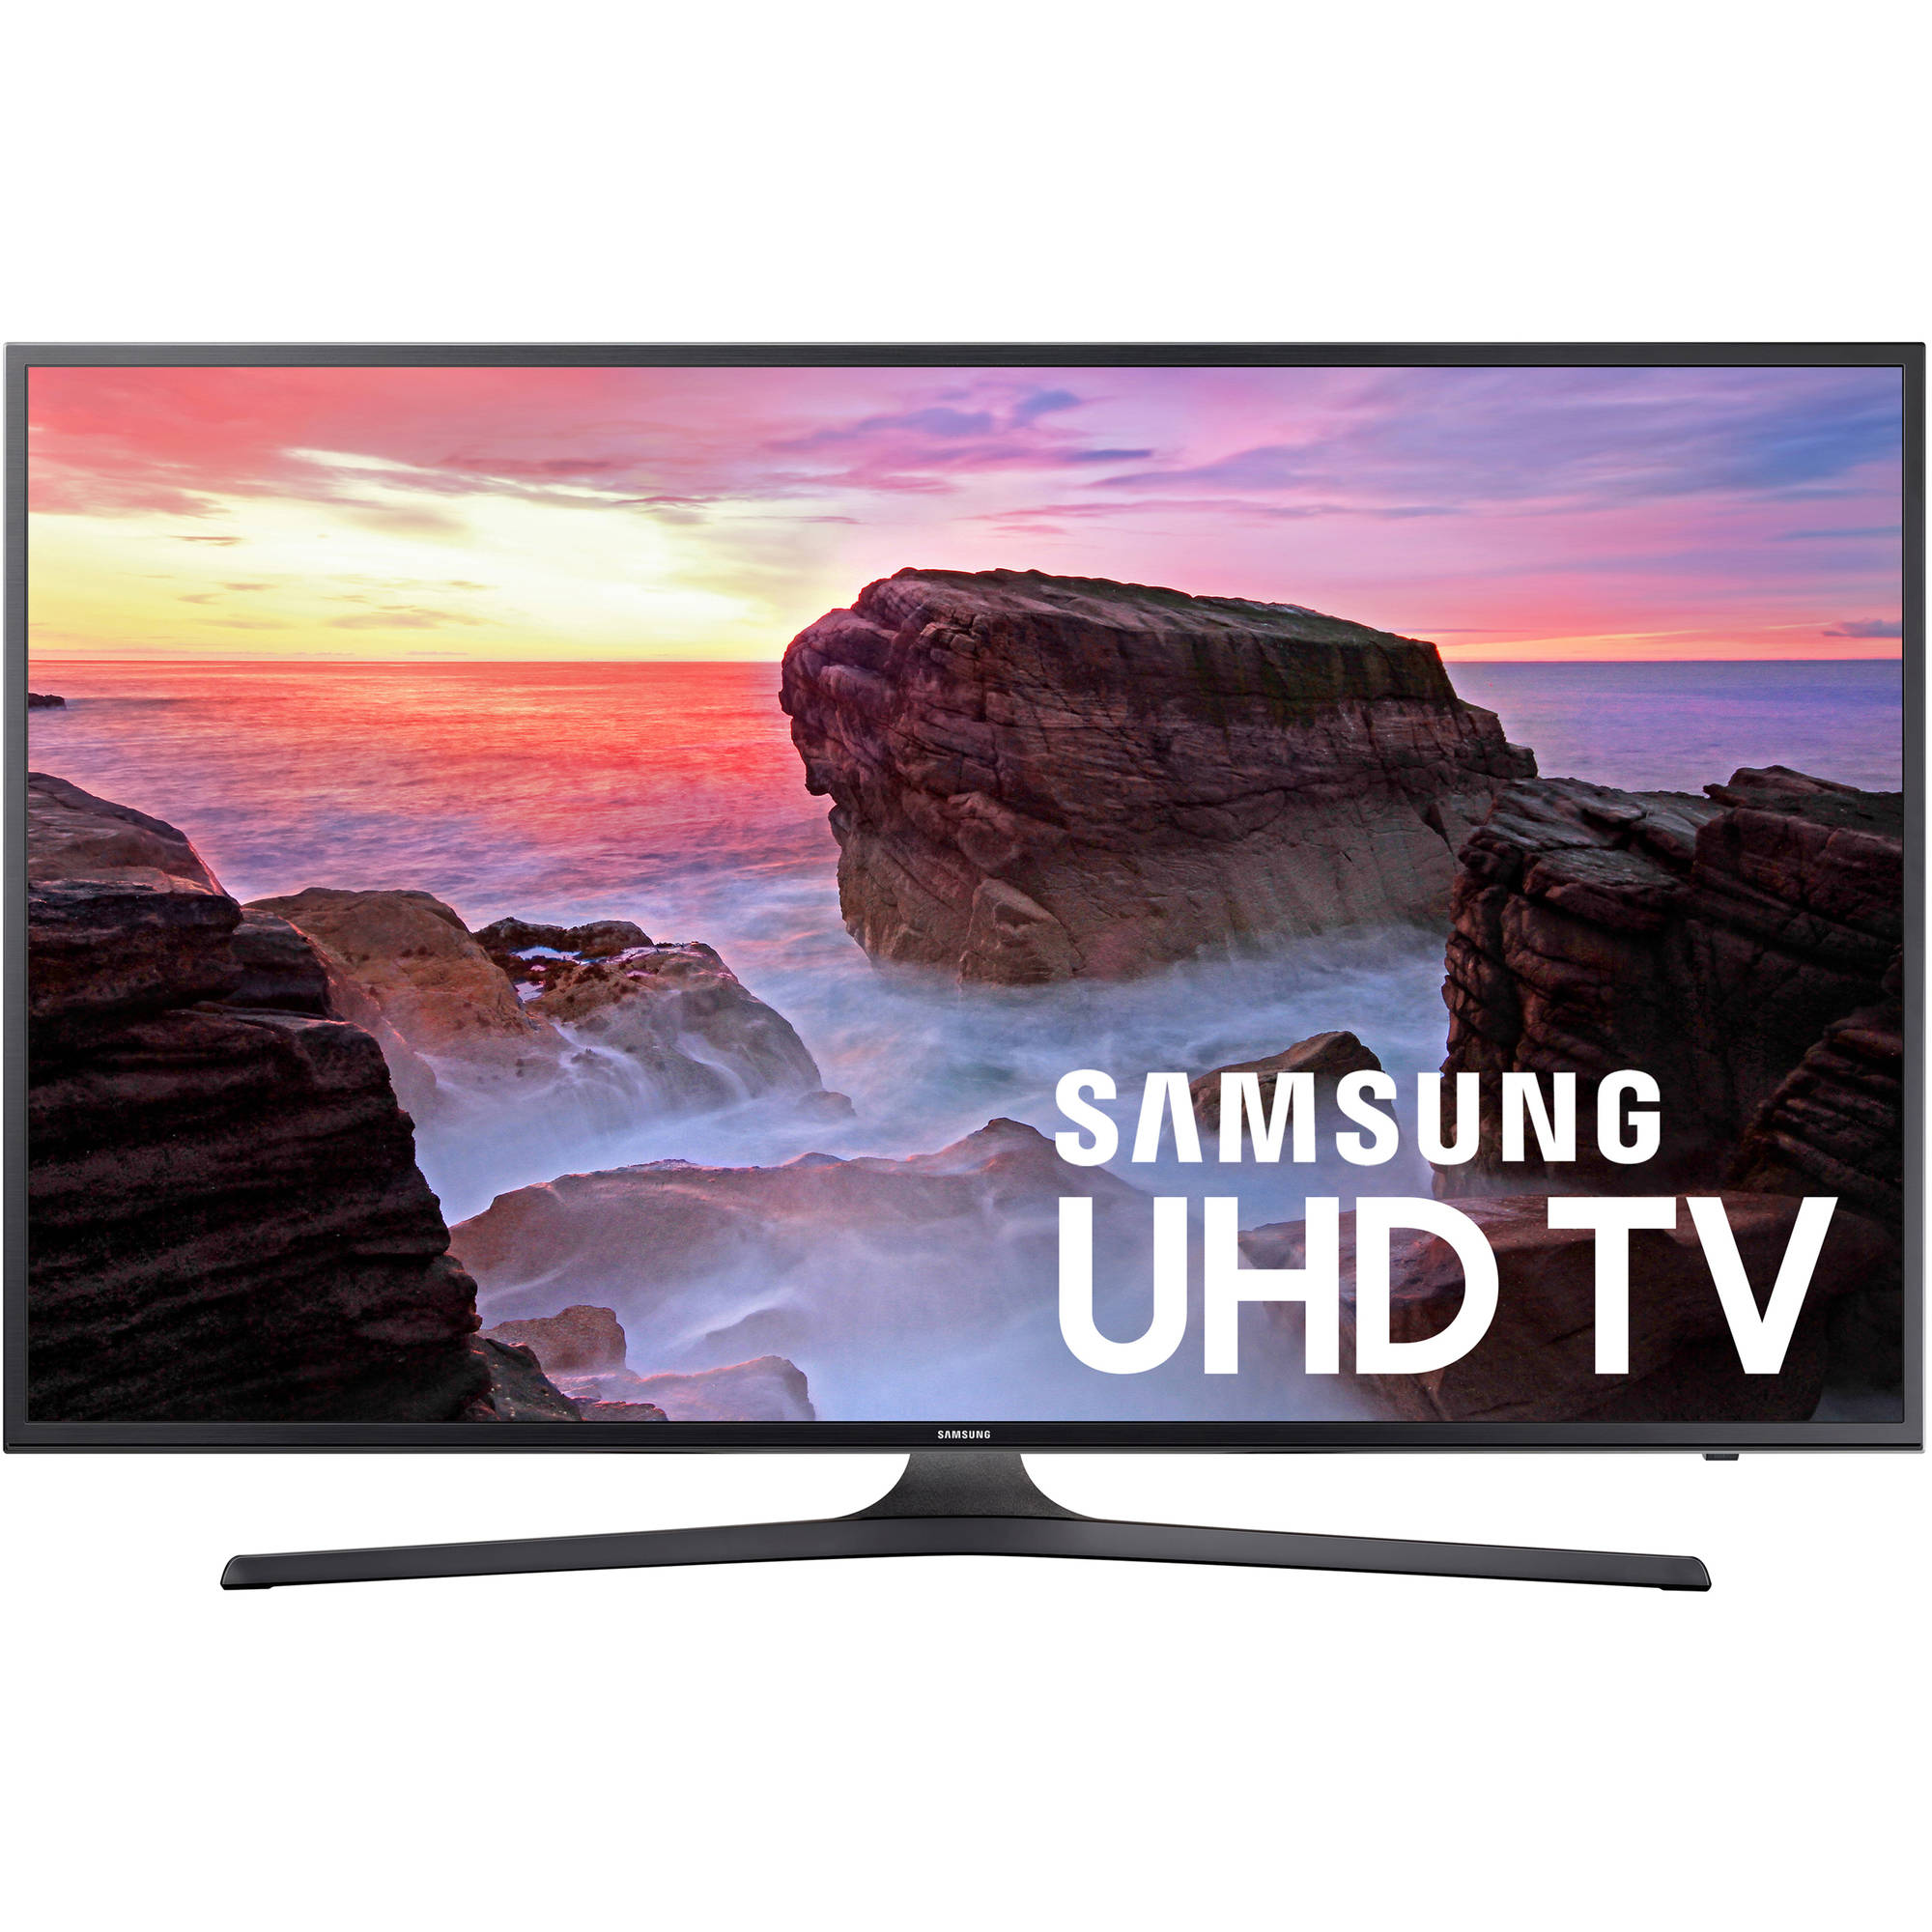 "Samsung 55"" Class 4K (2160P) Smart LED TV (UN55MU6300FXZA)"